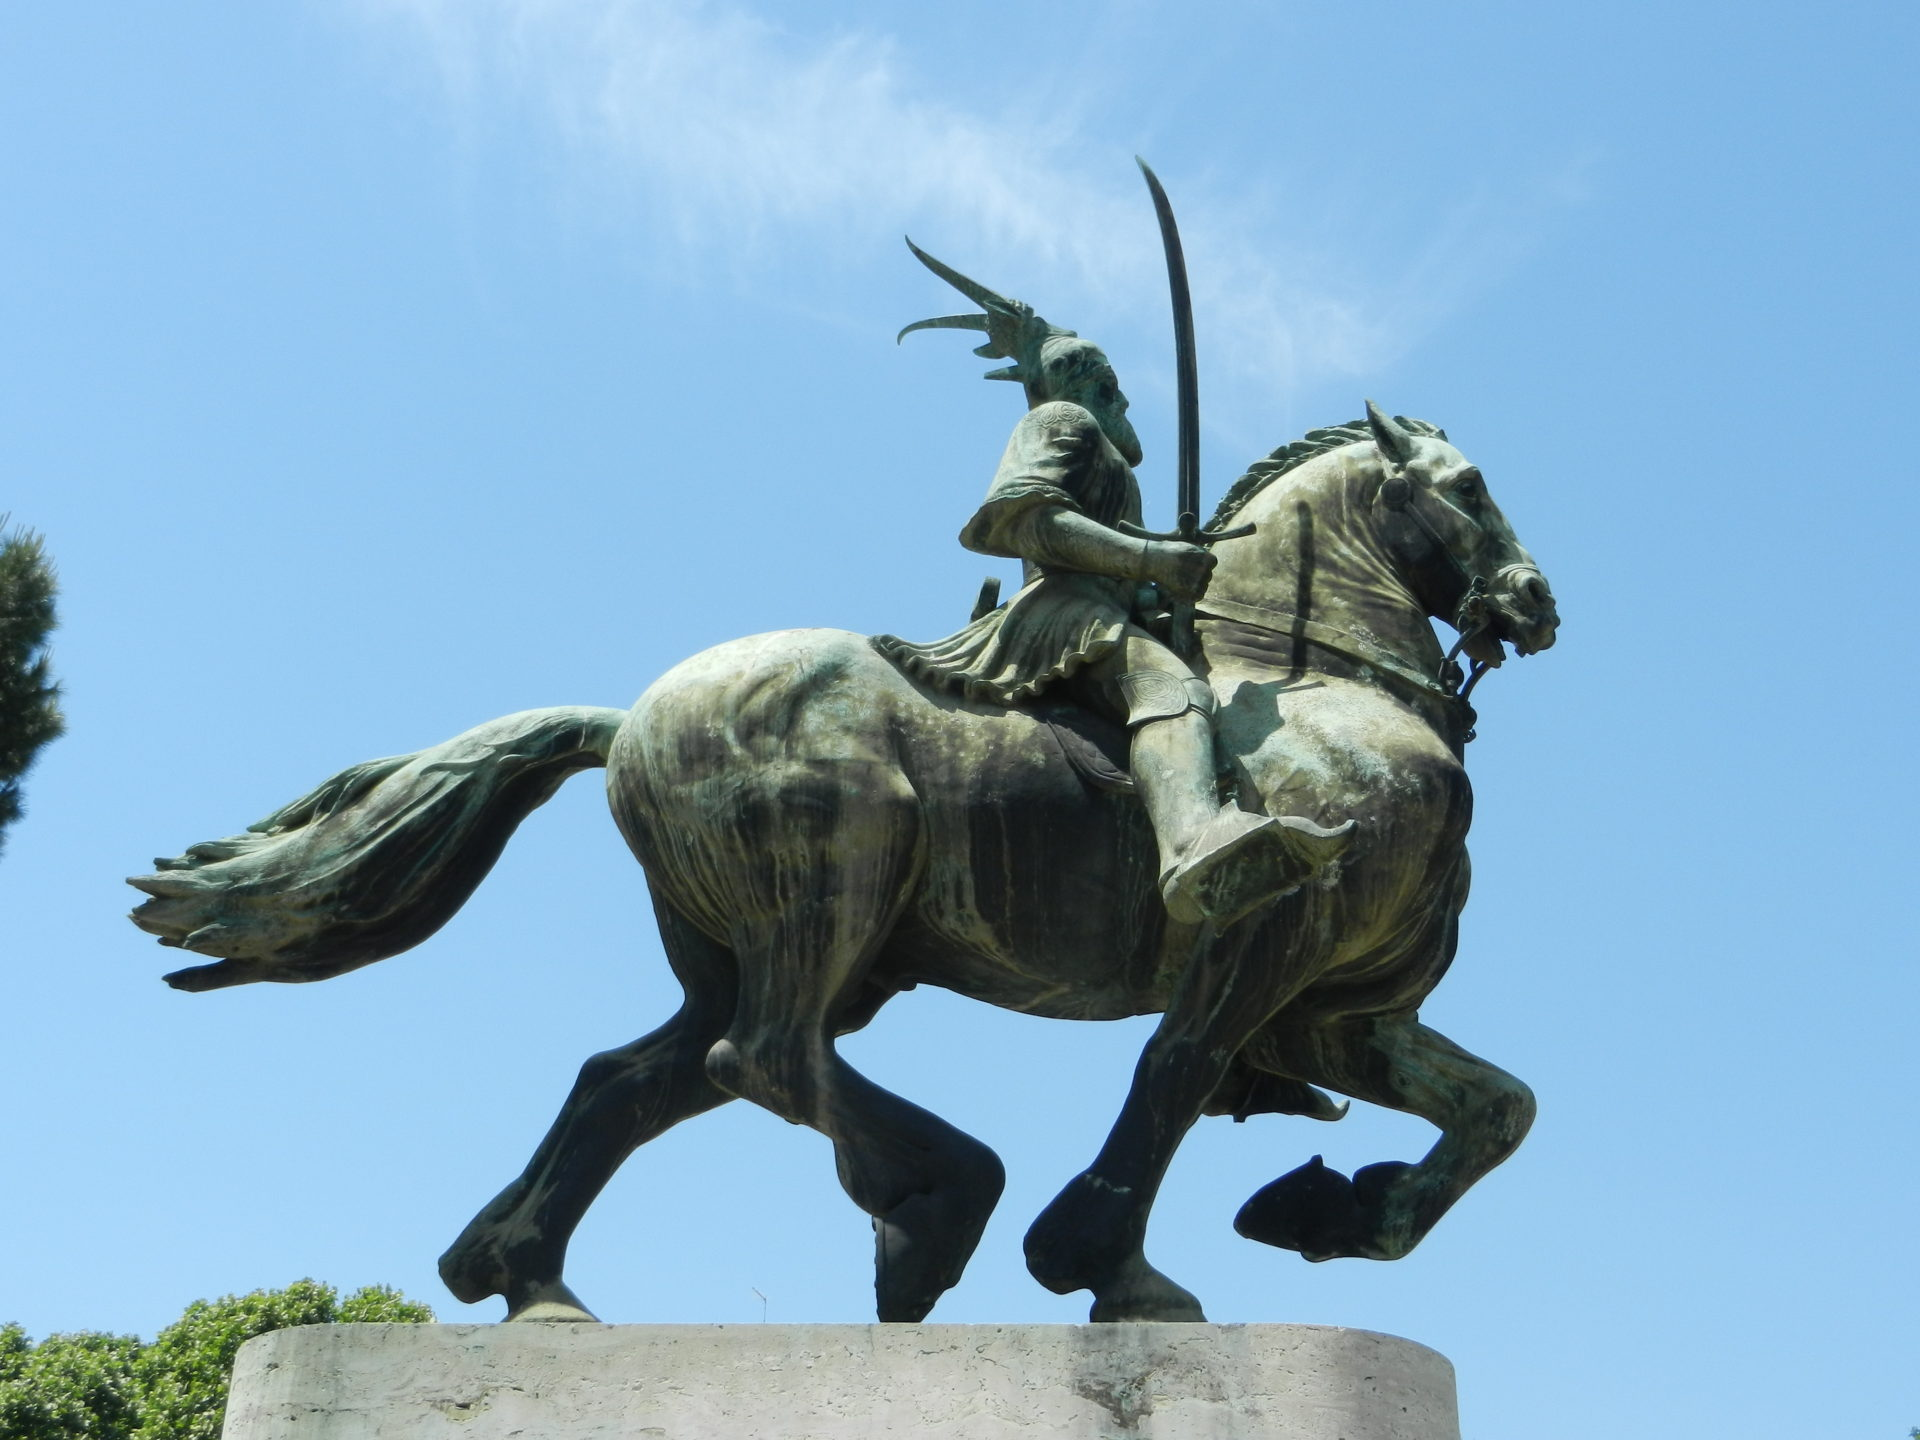 rinoplastika tirane rome - photo#5